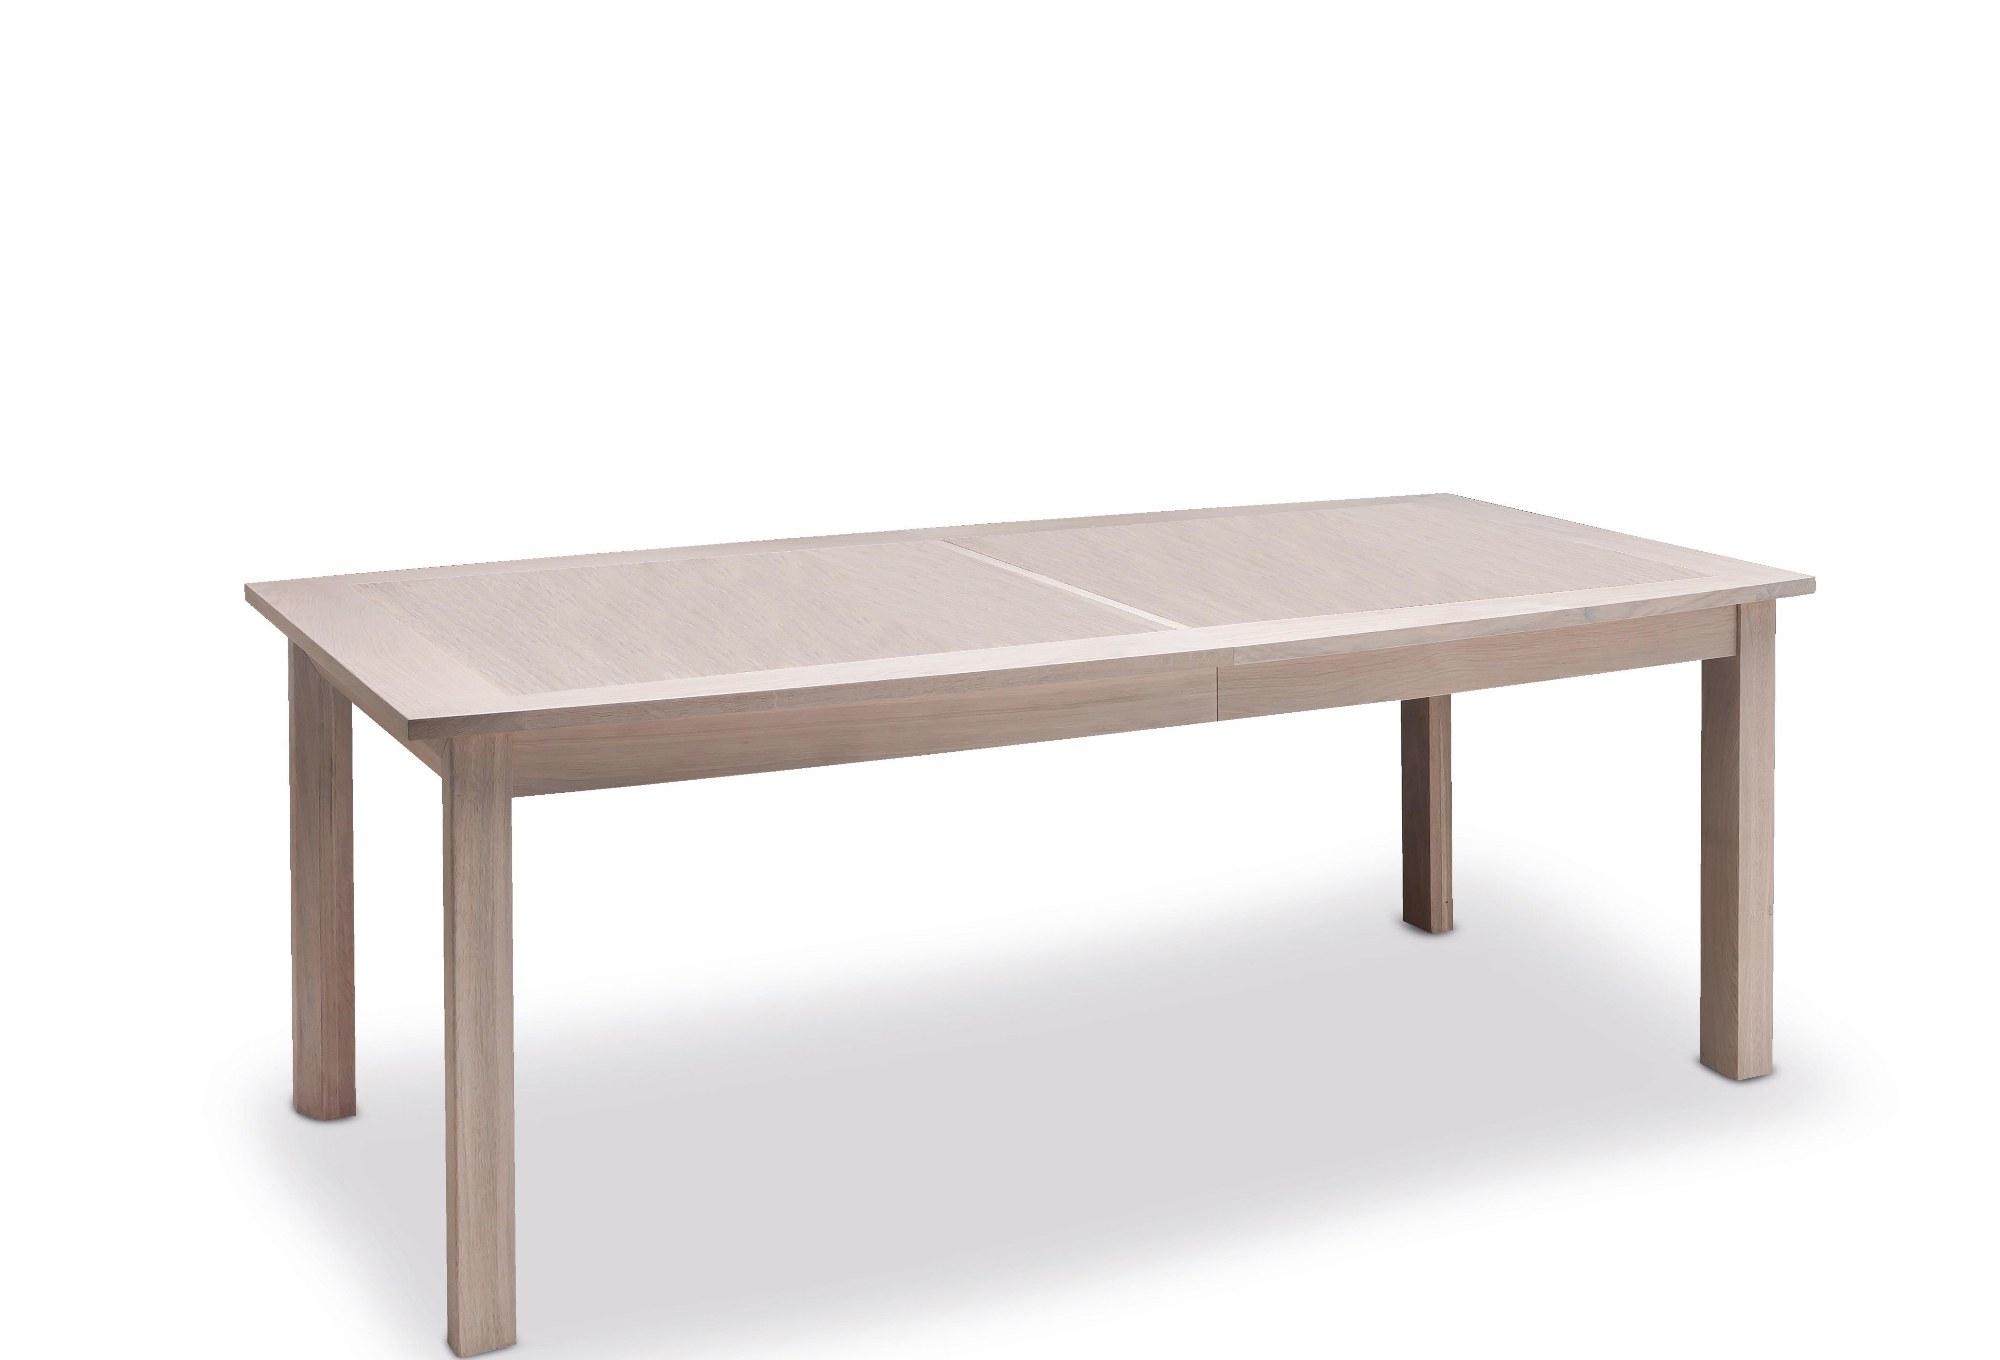 Table Belem quatre pieds